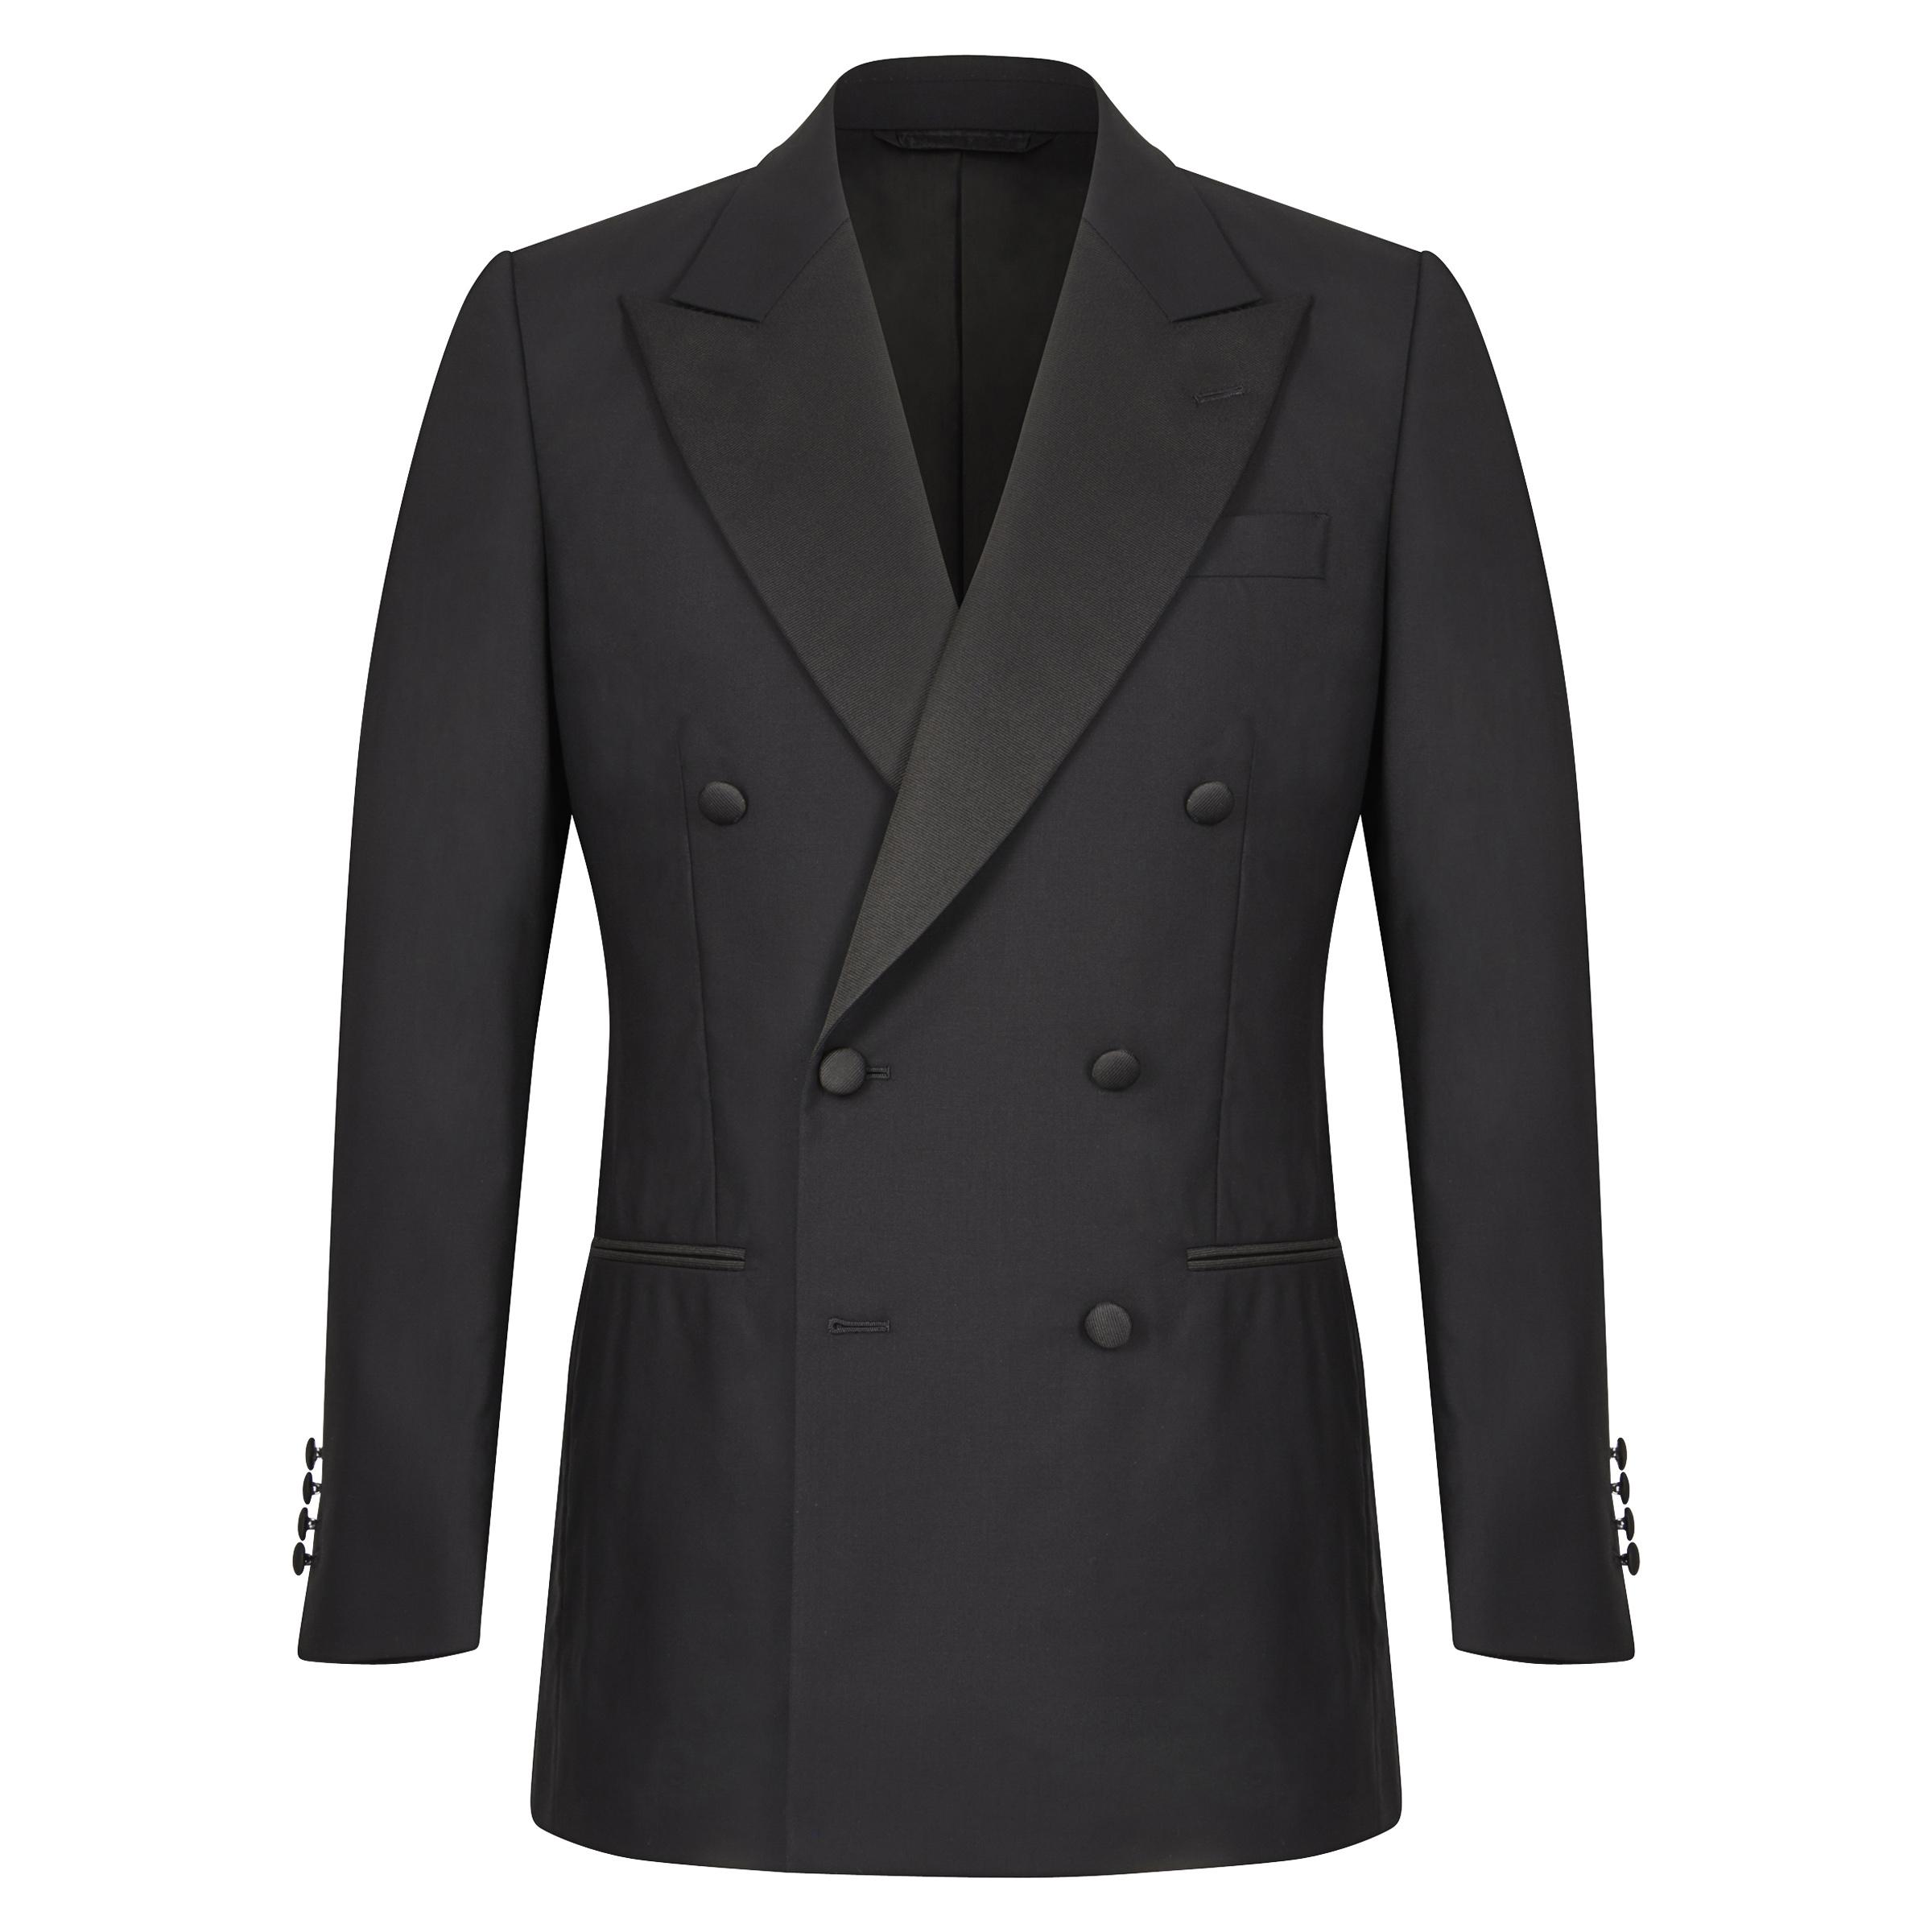 Black Wool Double-Breasted Dinner Jacket